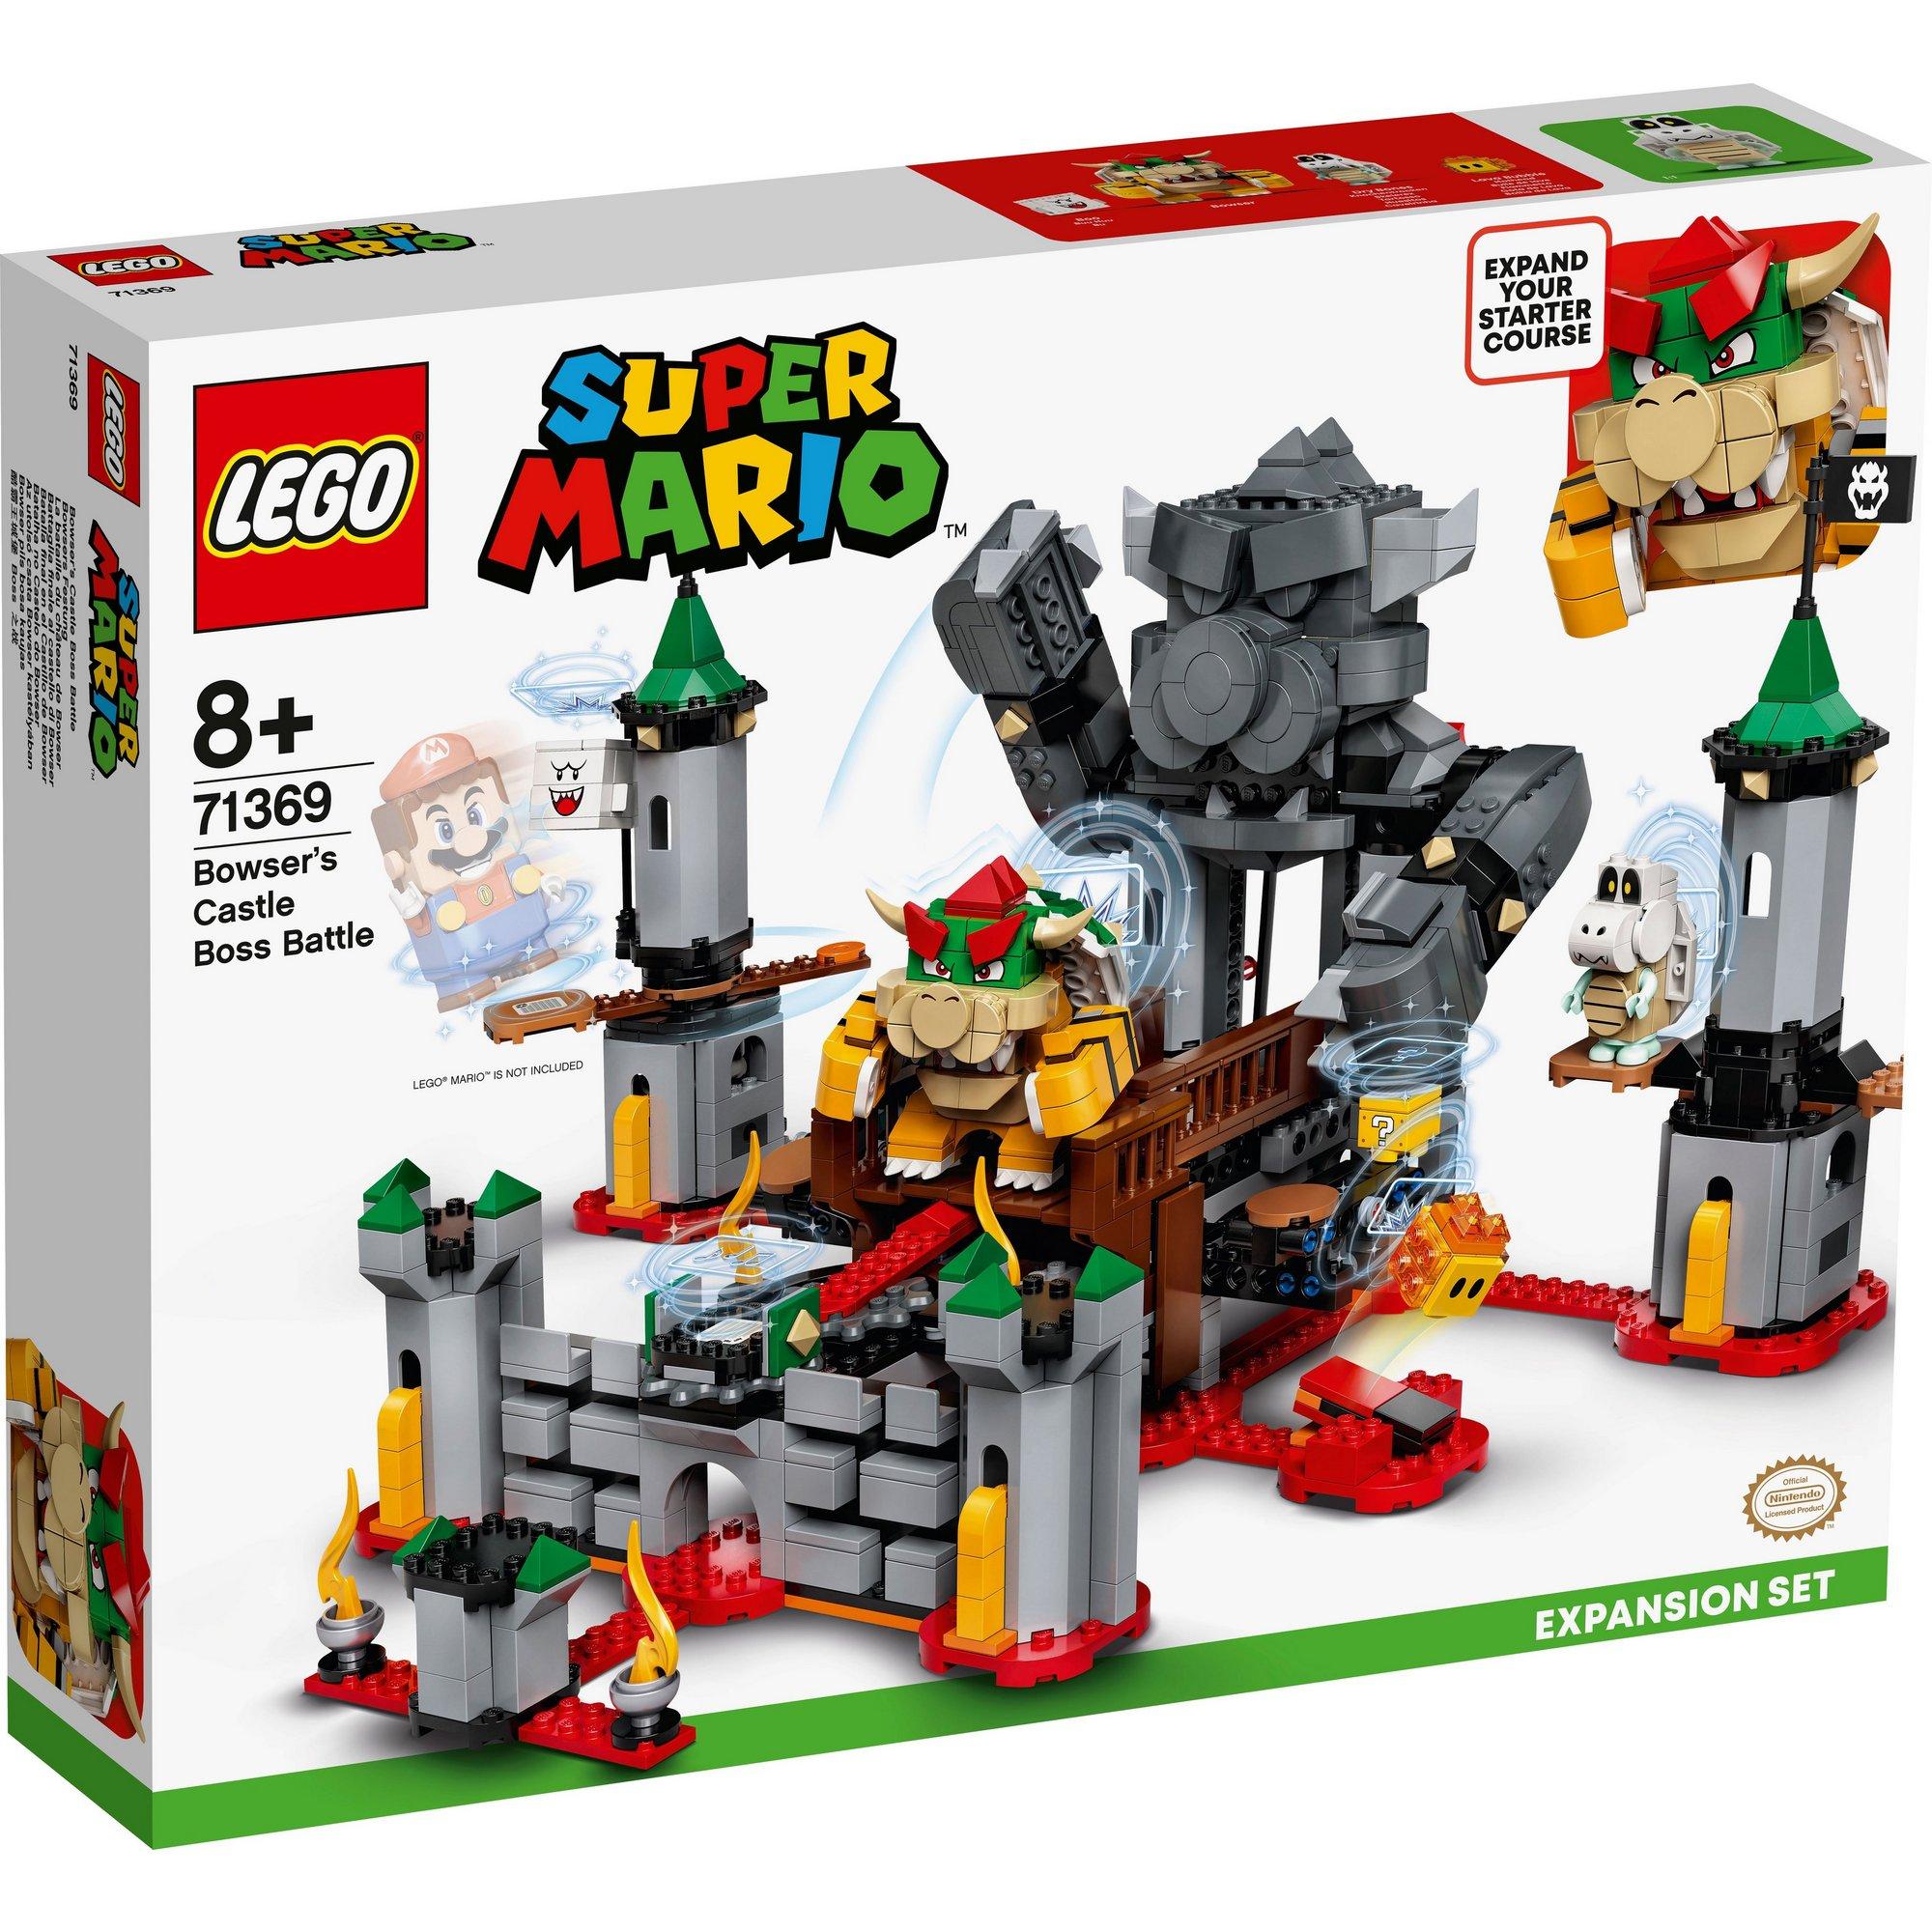 Image of LEGO Super Mario Bowsers Castle Boss Battle Expansion Set